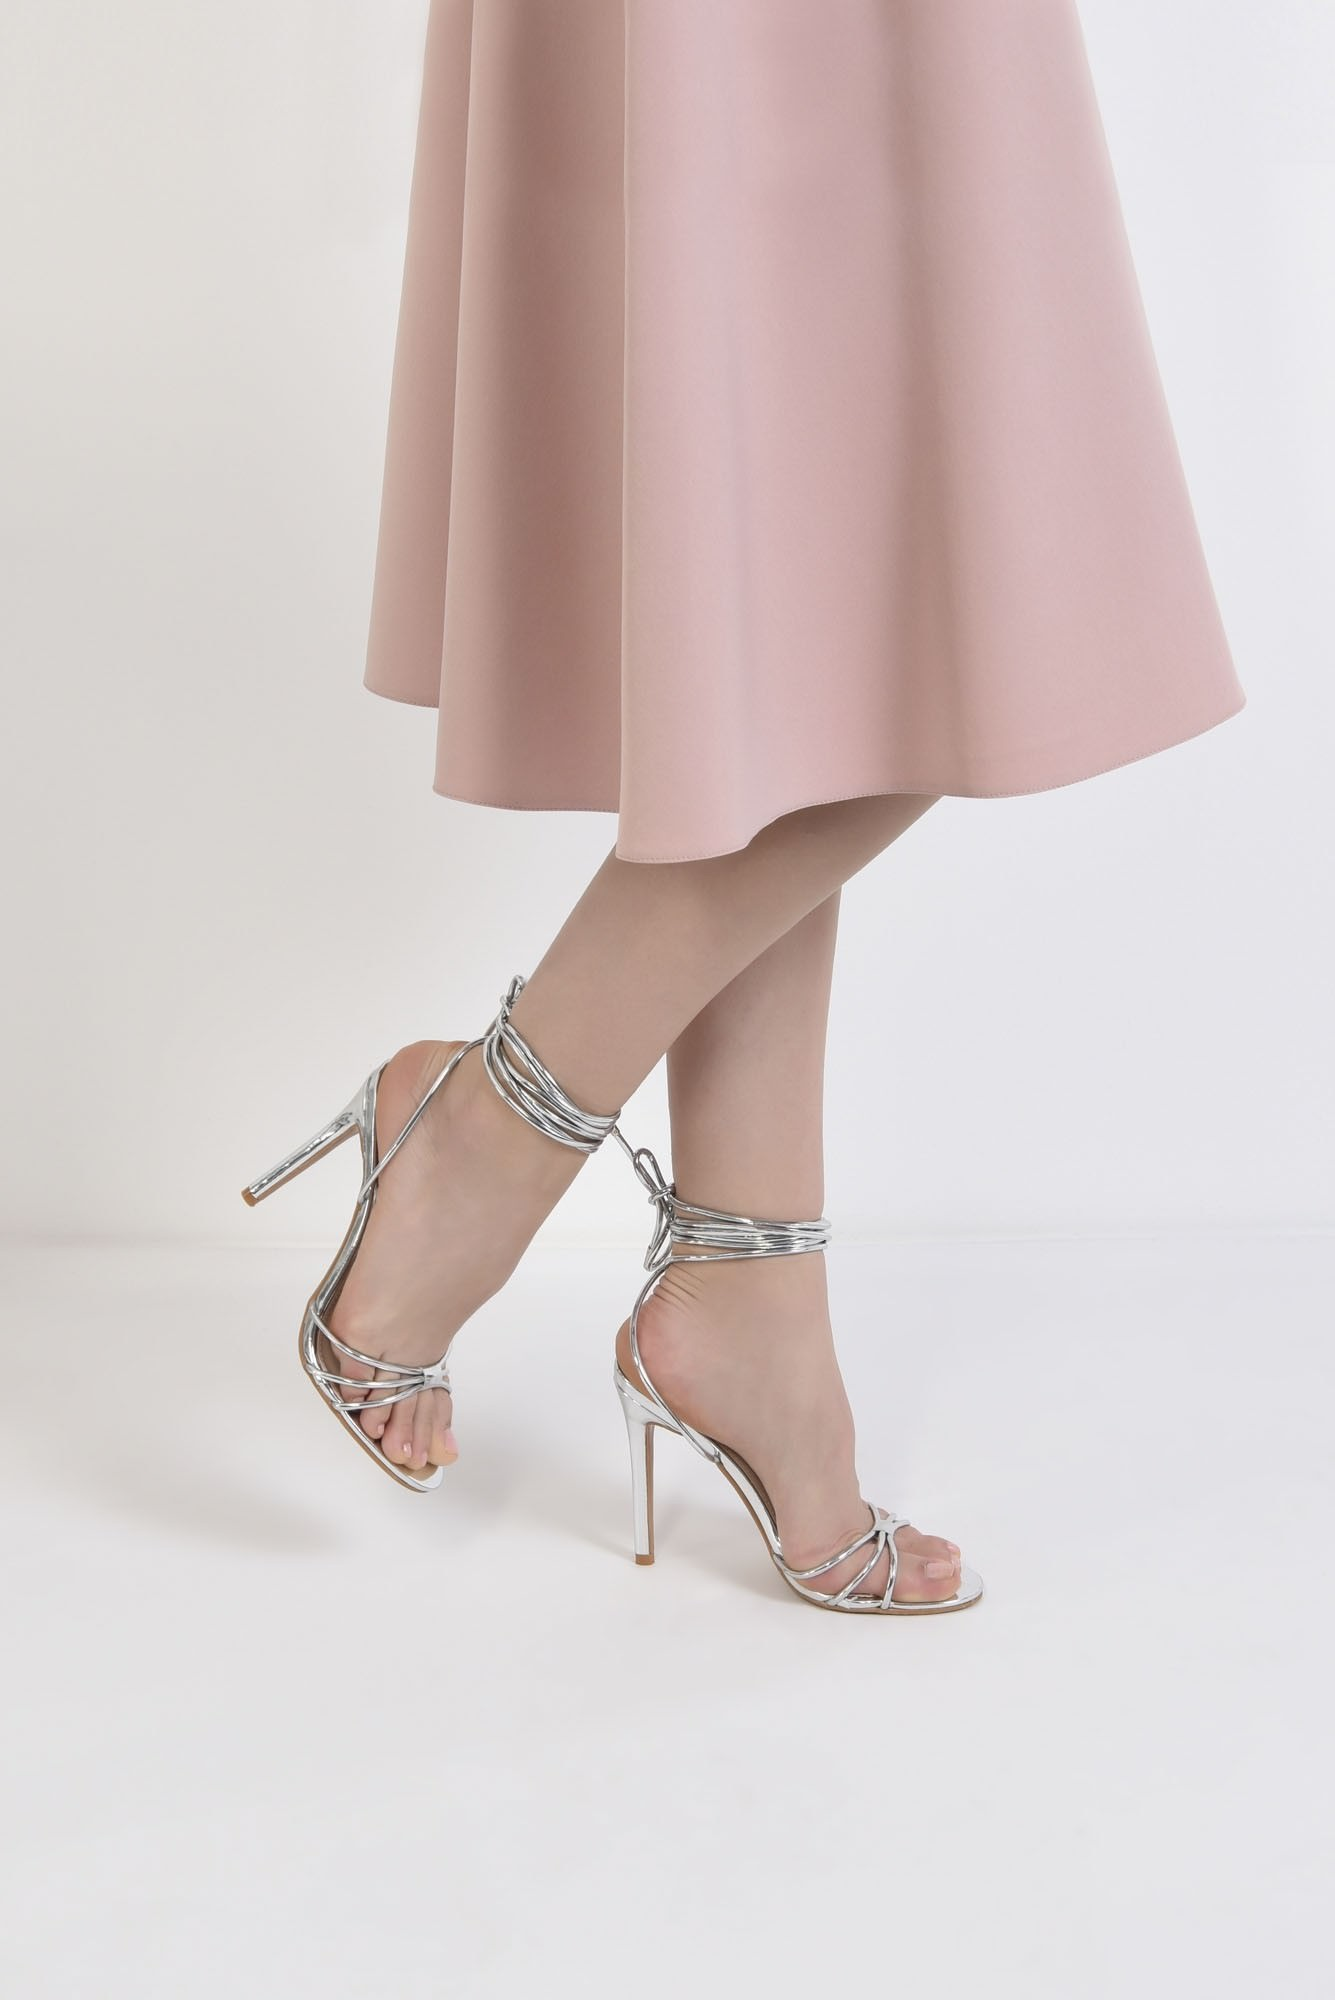 3 - sandale elegante, argintii, cu snur, stiletto